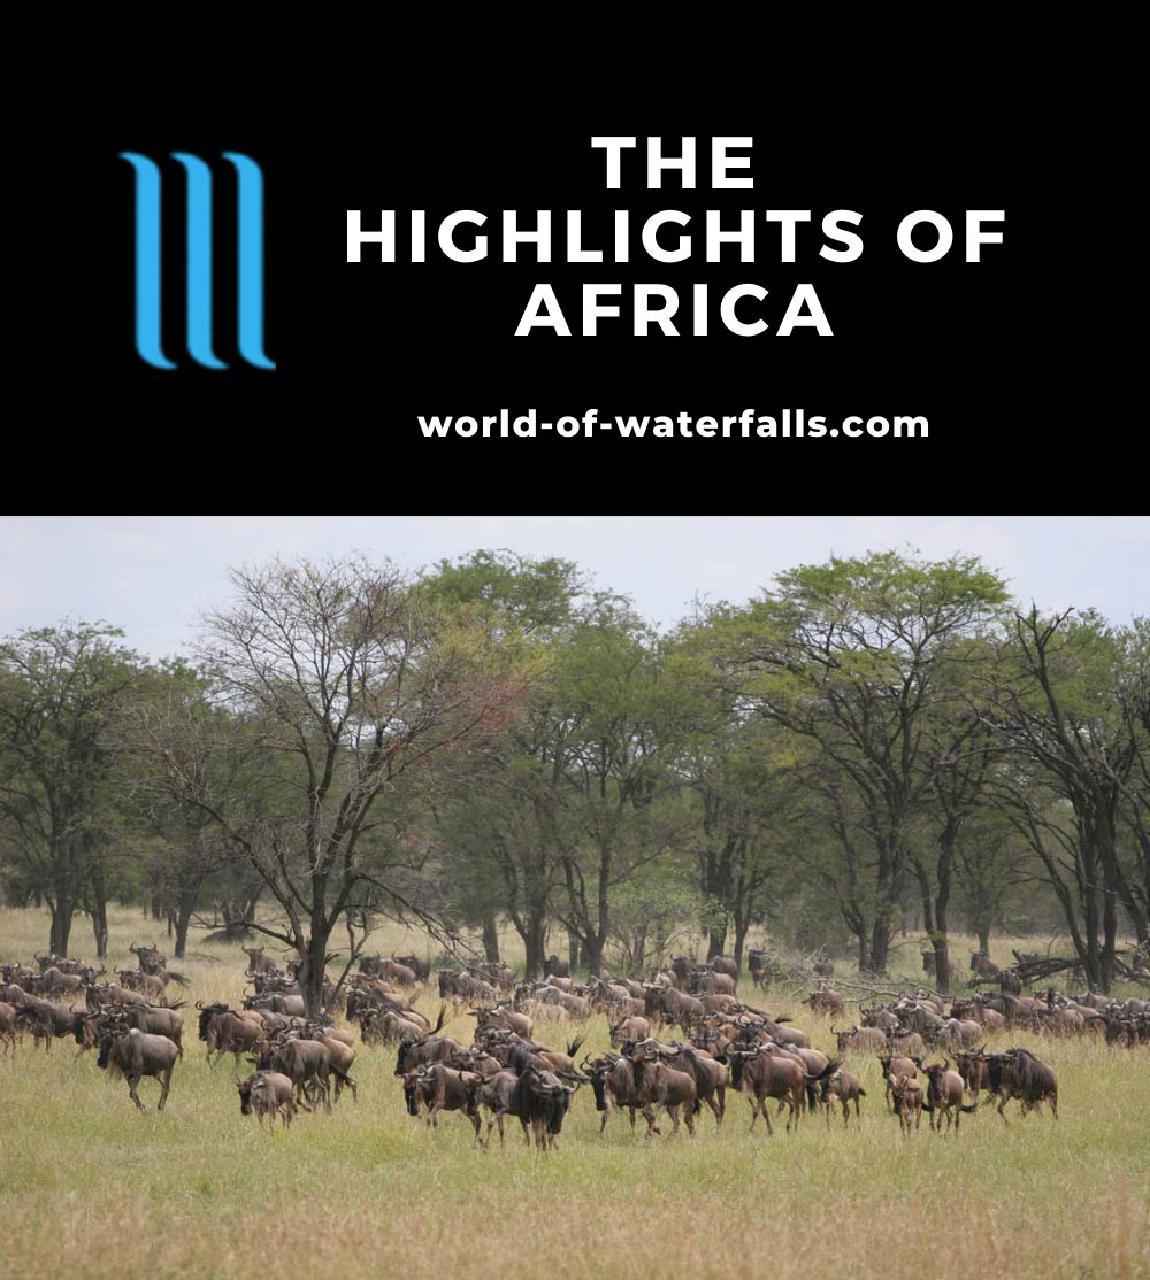 Africa Highlights